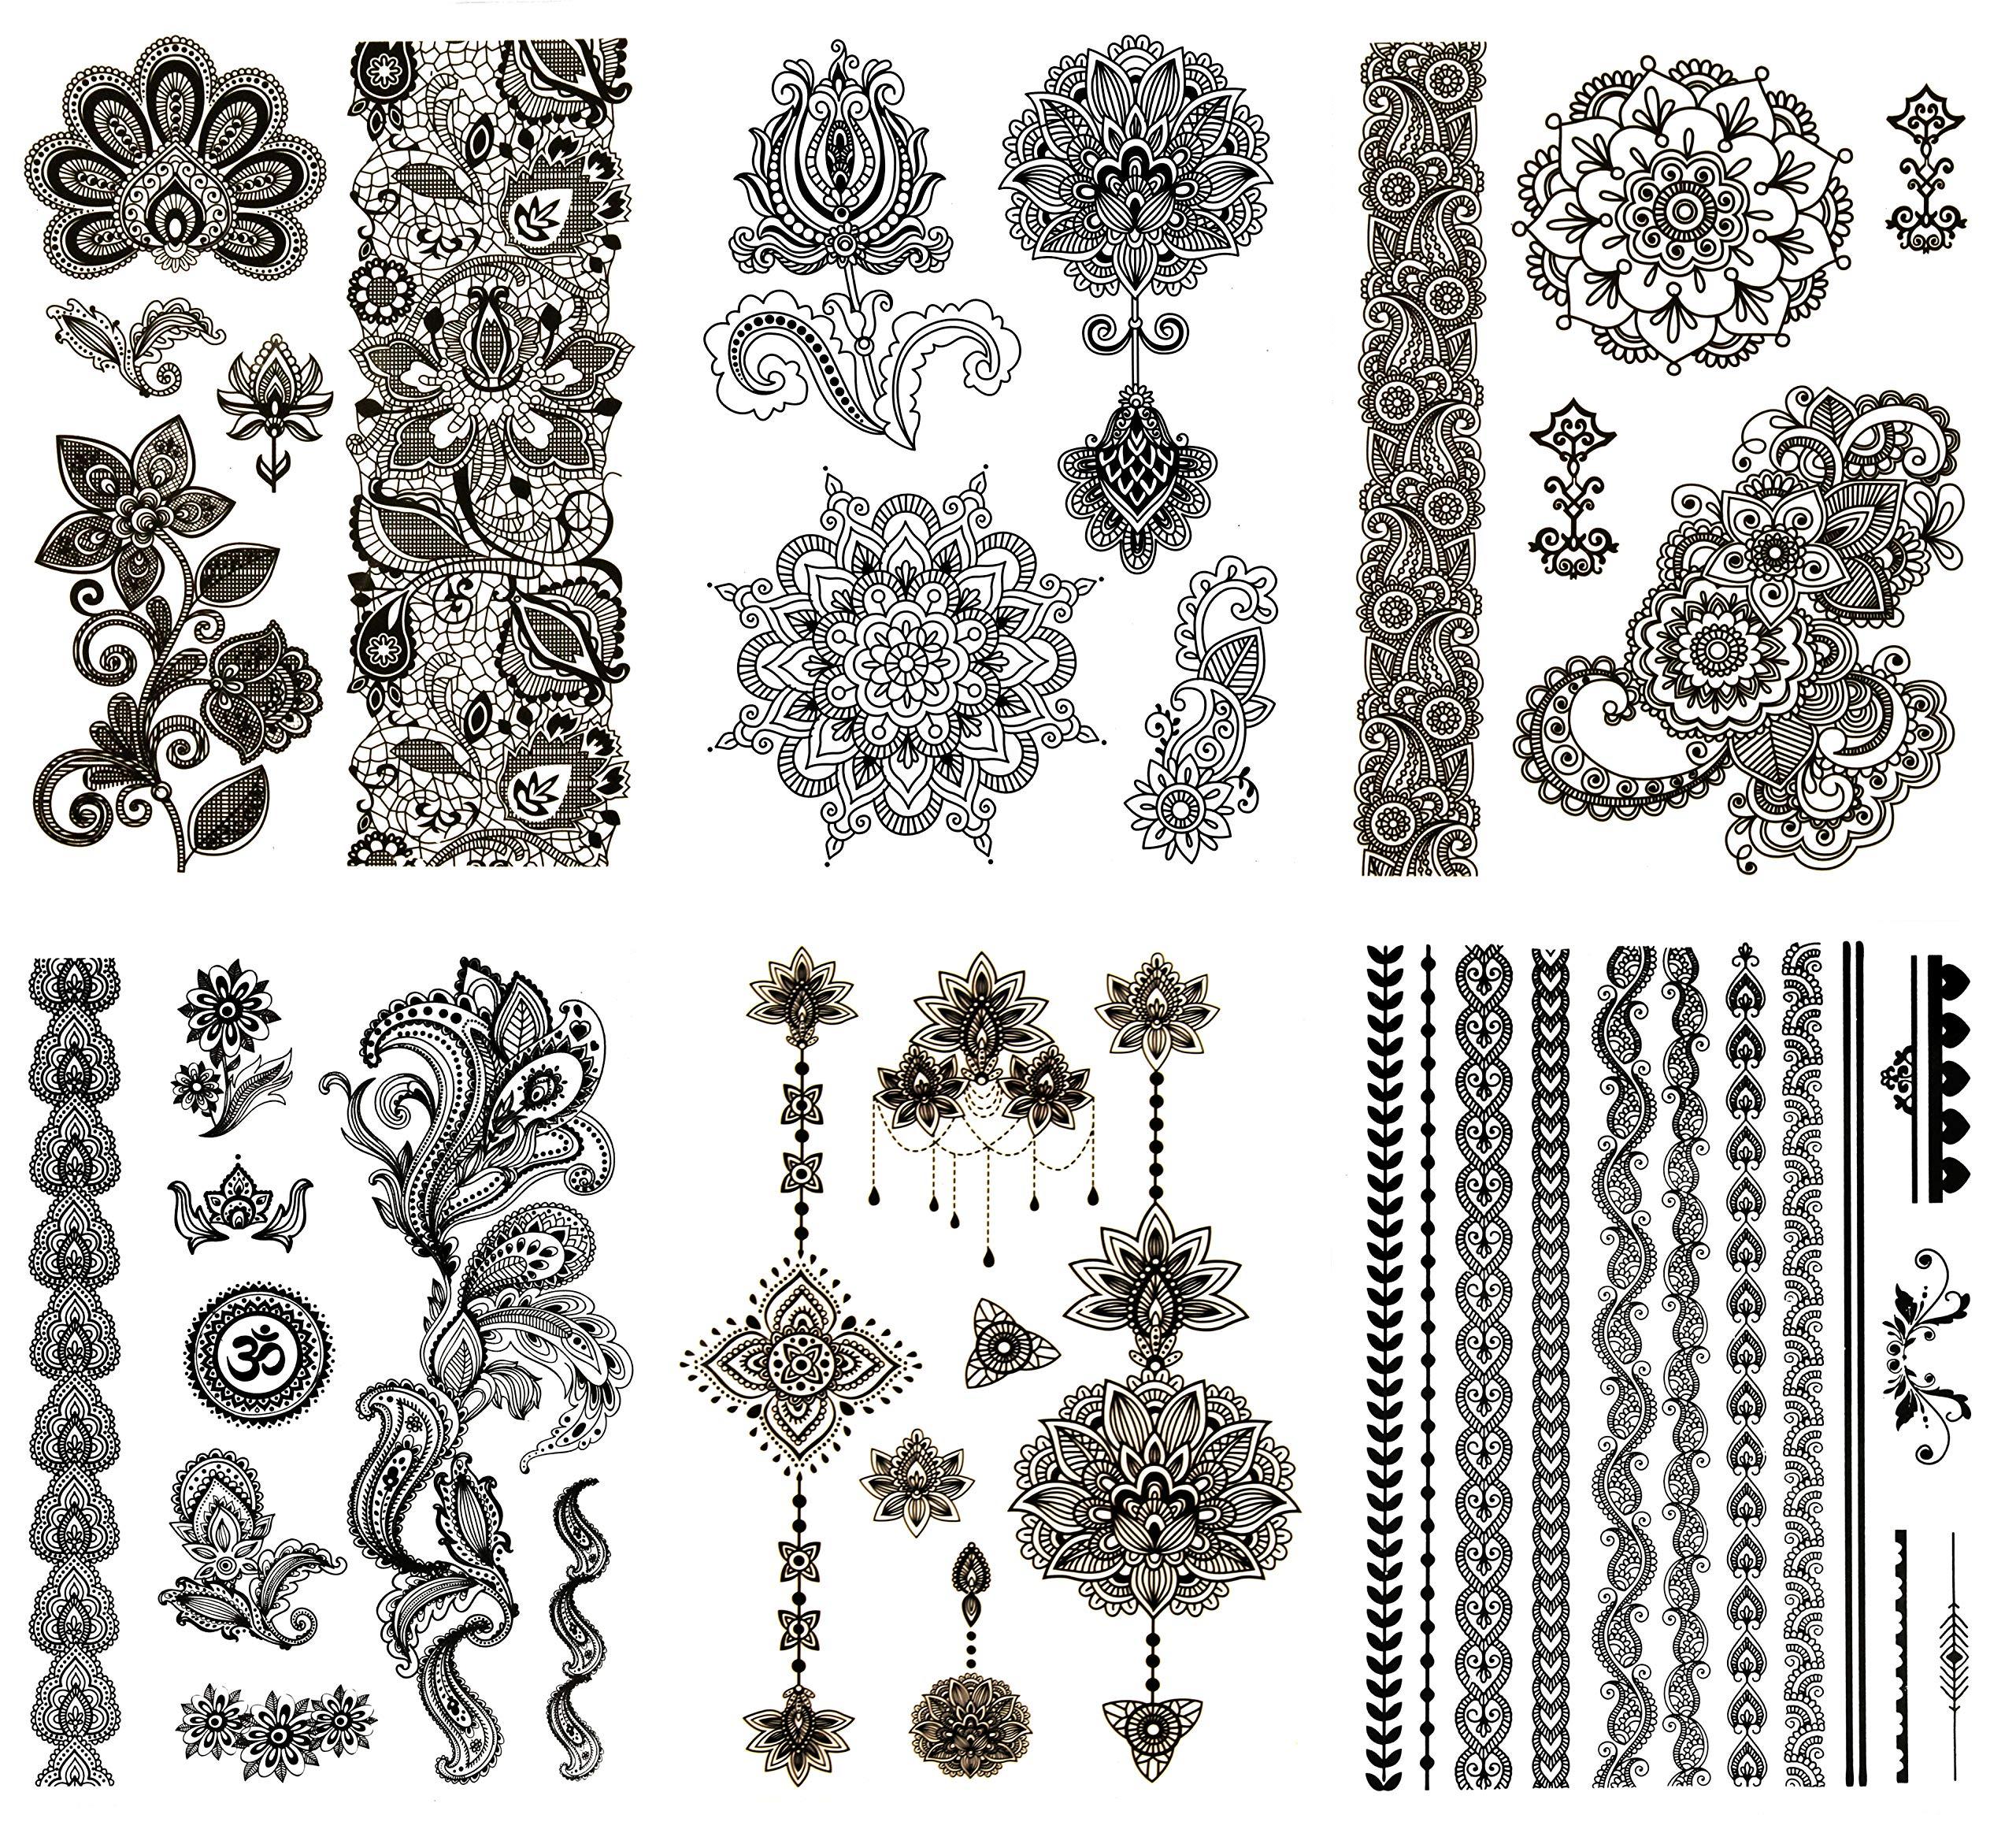 Henna Tattoo Paste Amazon: Amazon.com : 12 Pieces/Lot Sexy Mandala Flower Henna